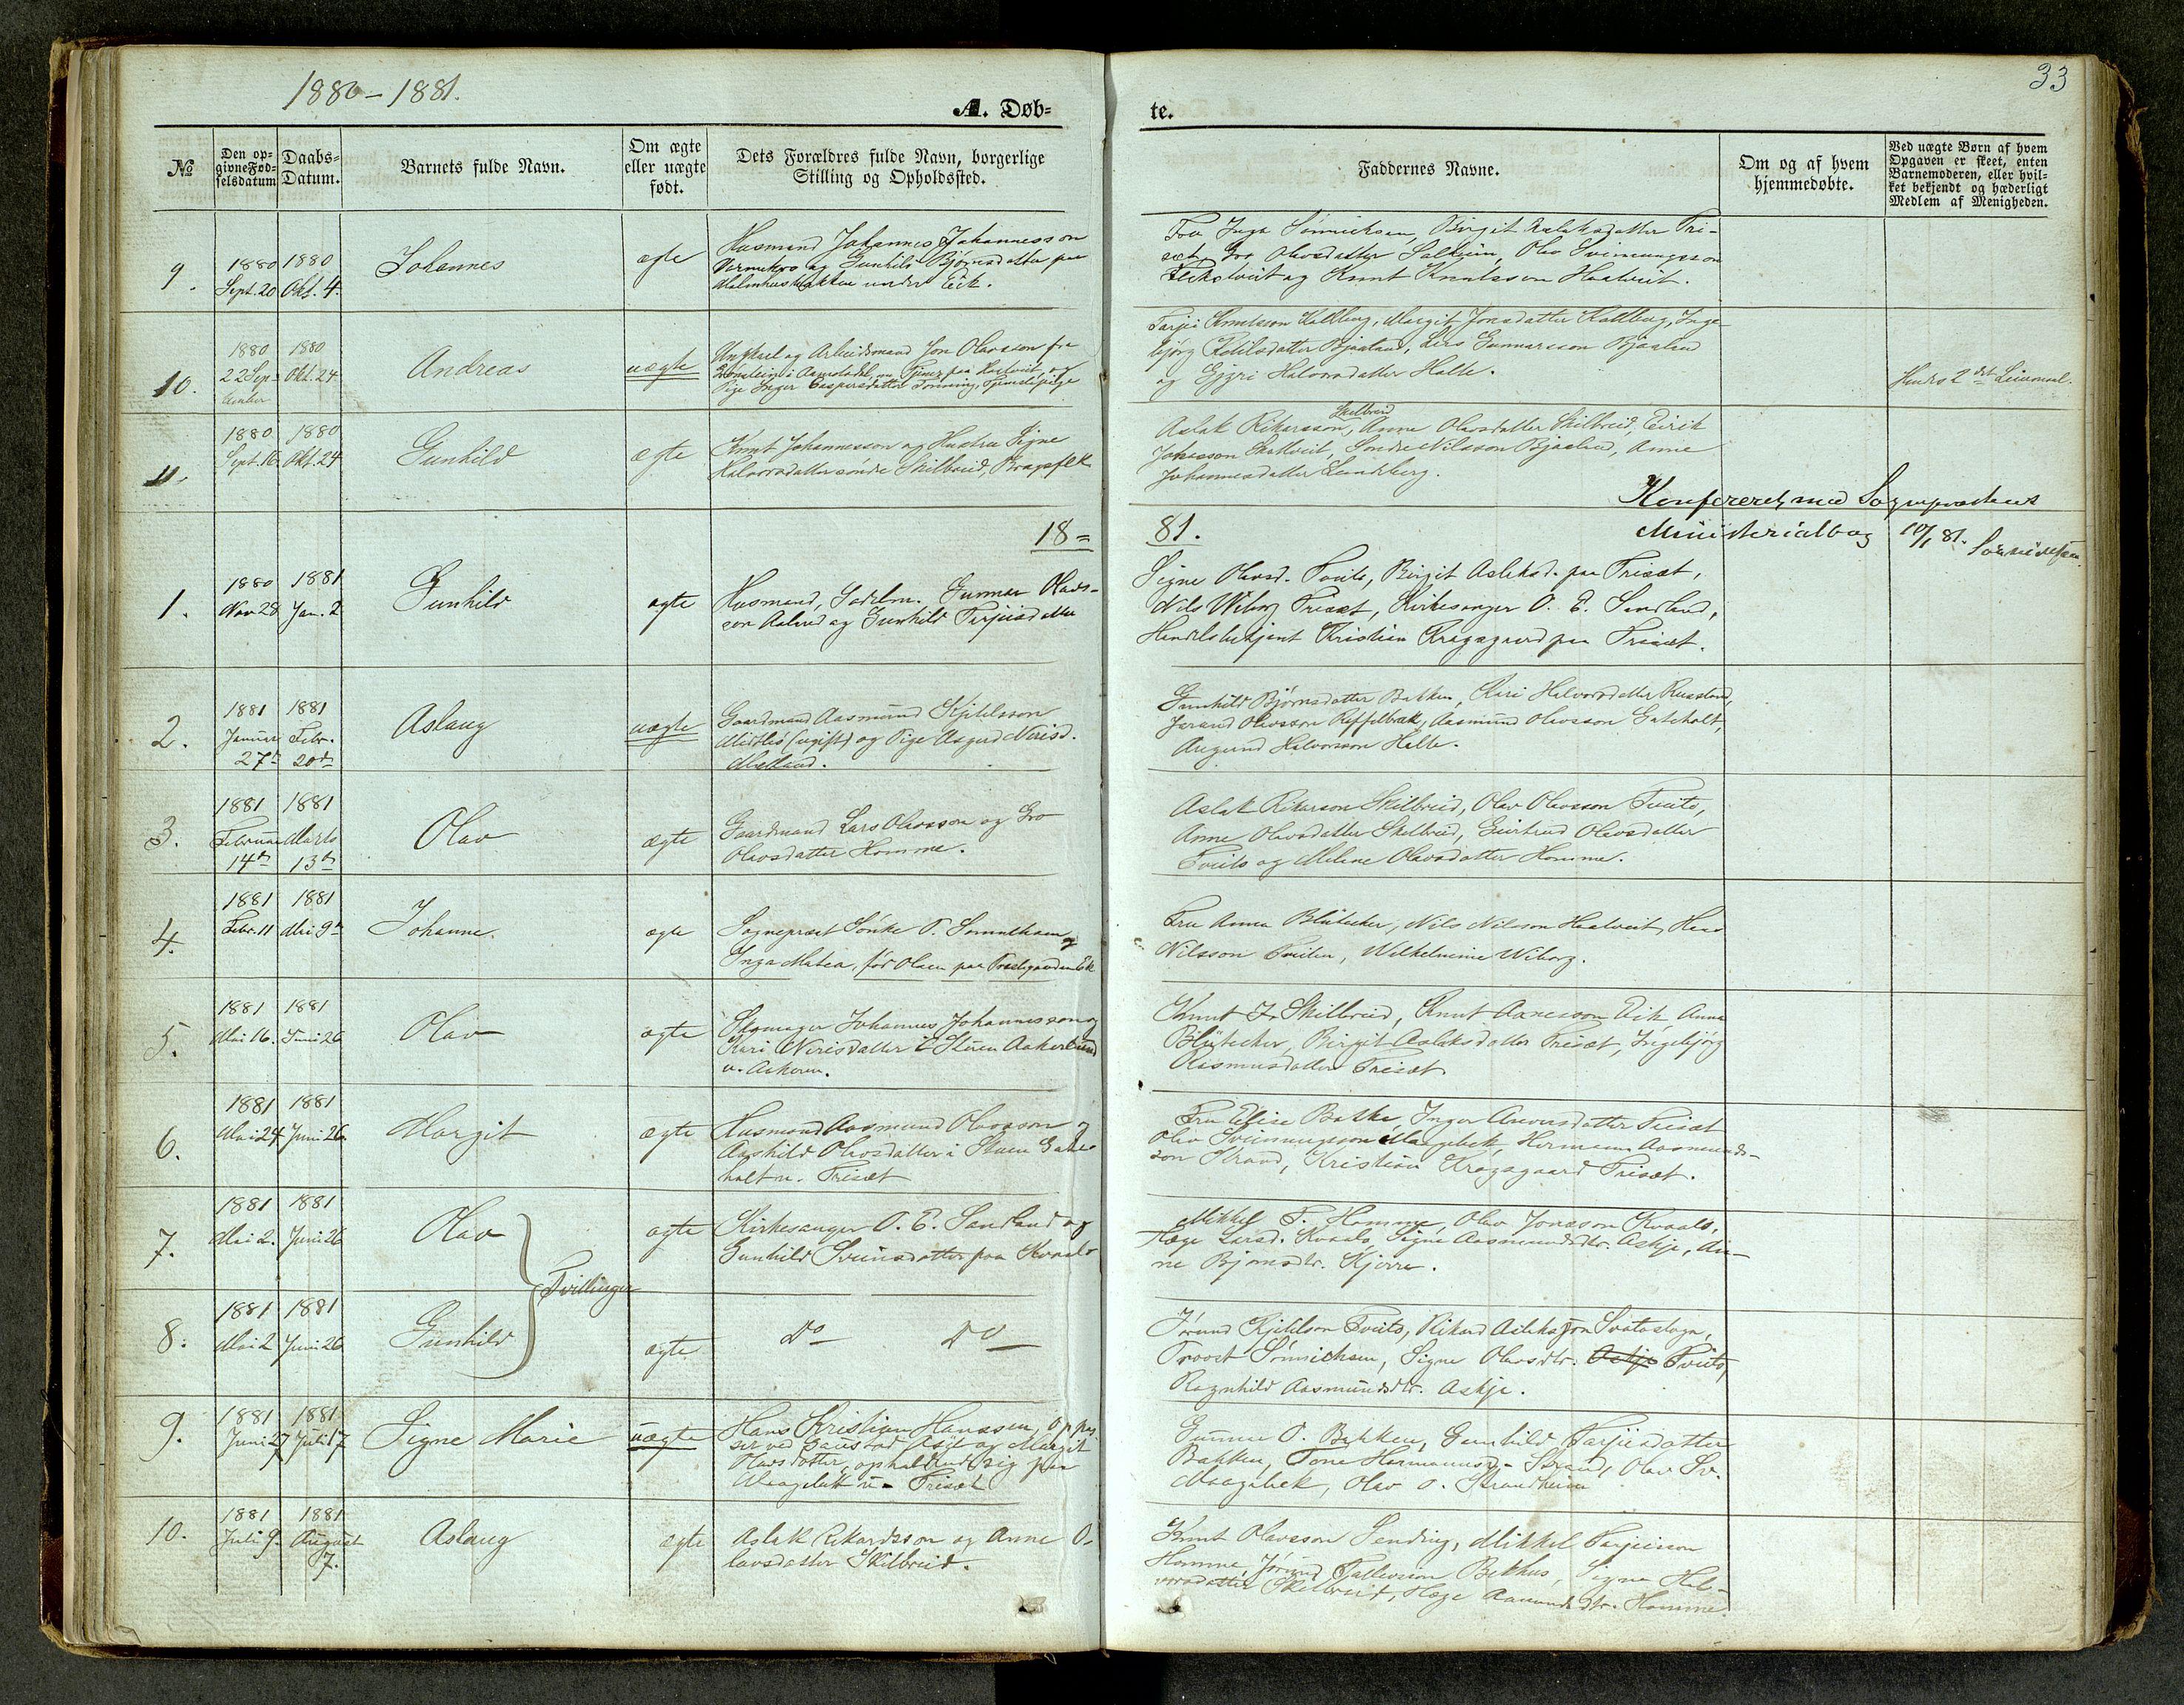 SAKO, Lårdal kirkebøker, G/Ga/L0002: Klokkerbok nr. I 2, 1861-1890, s. 33